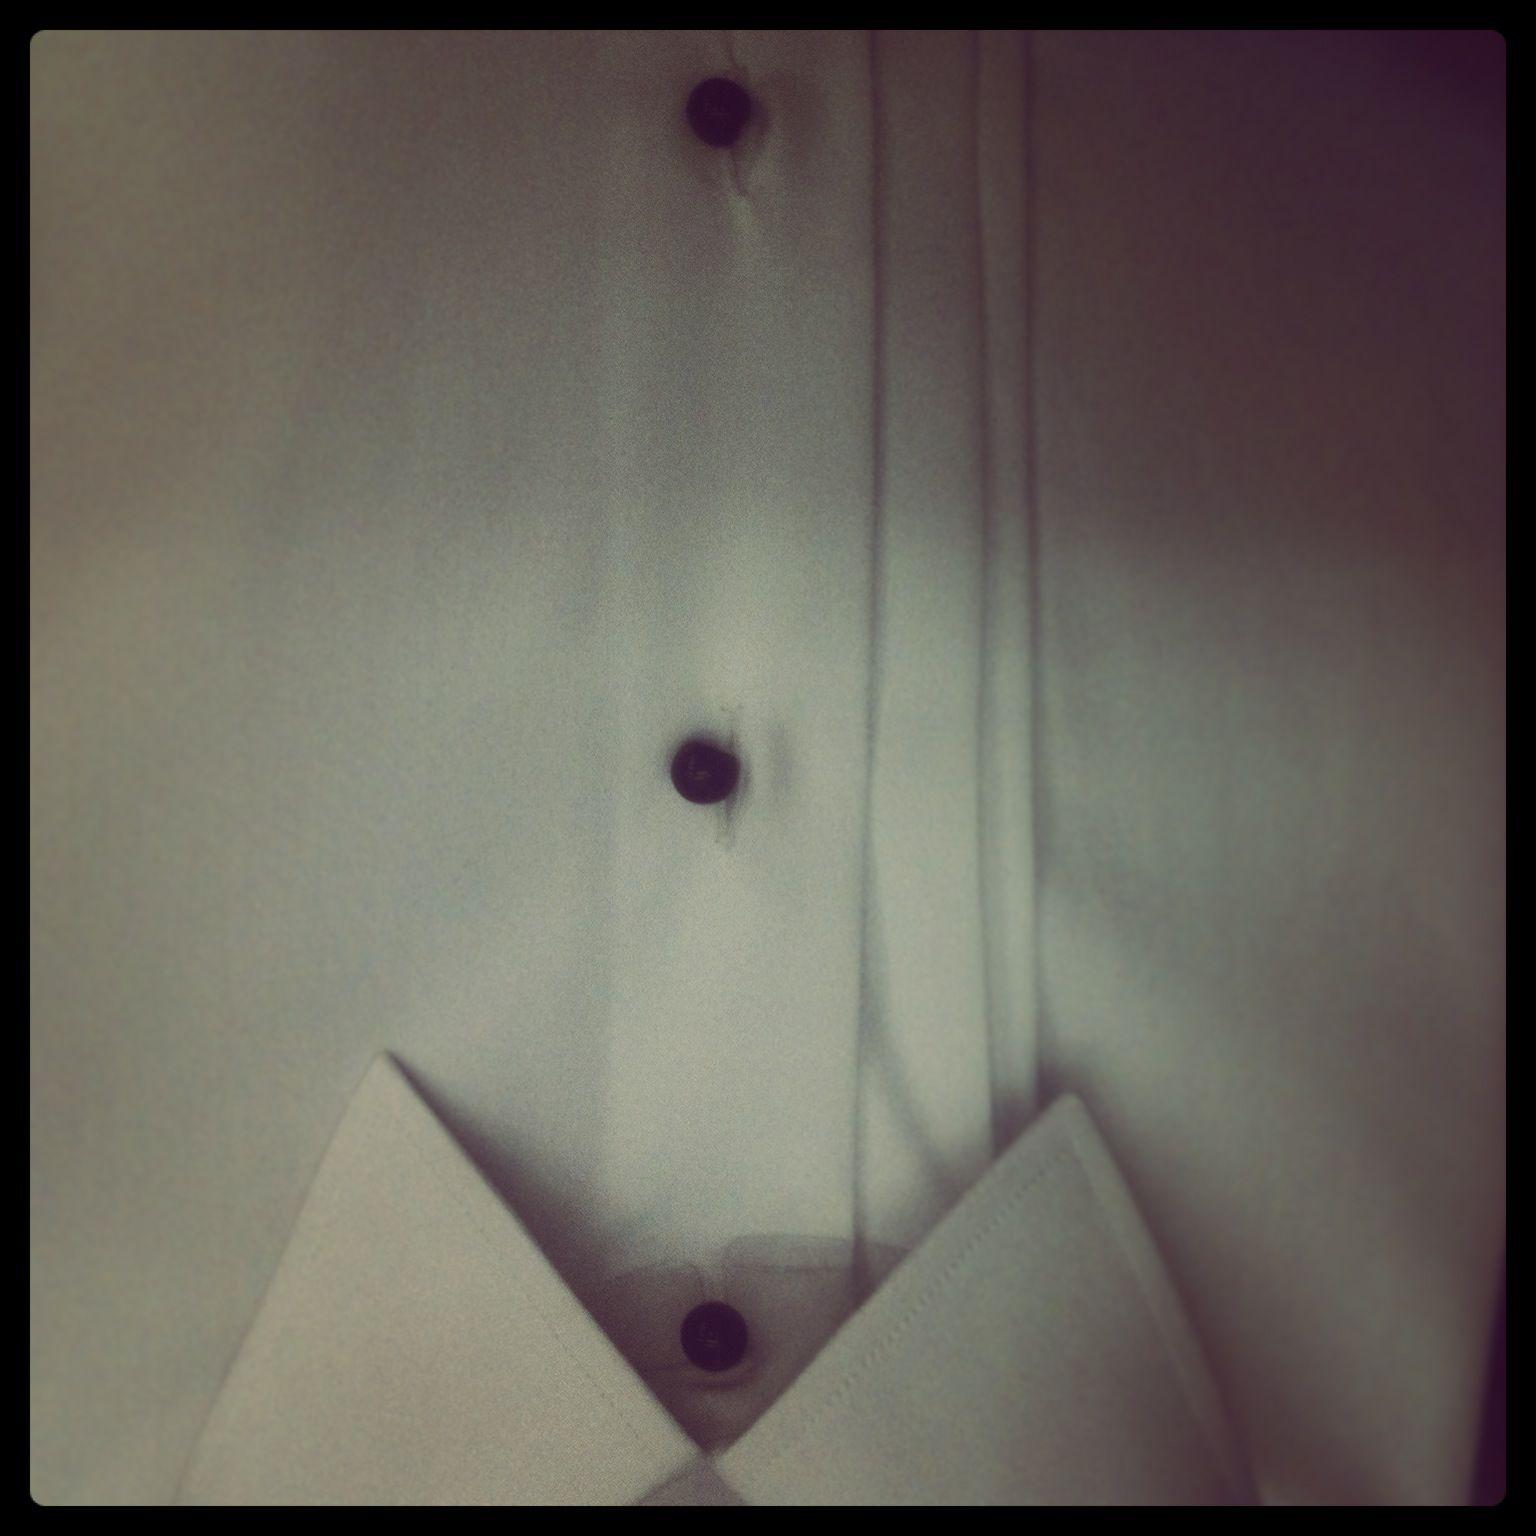 Bespoke wedding shirt handmade by Christakis Athens